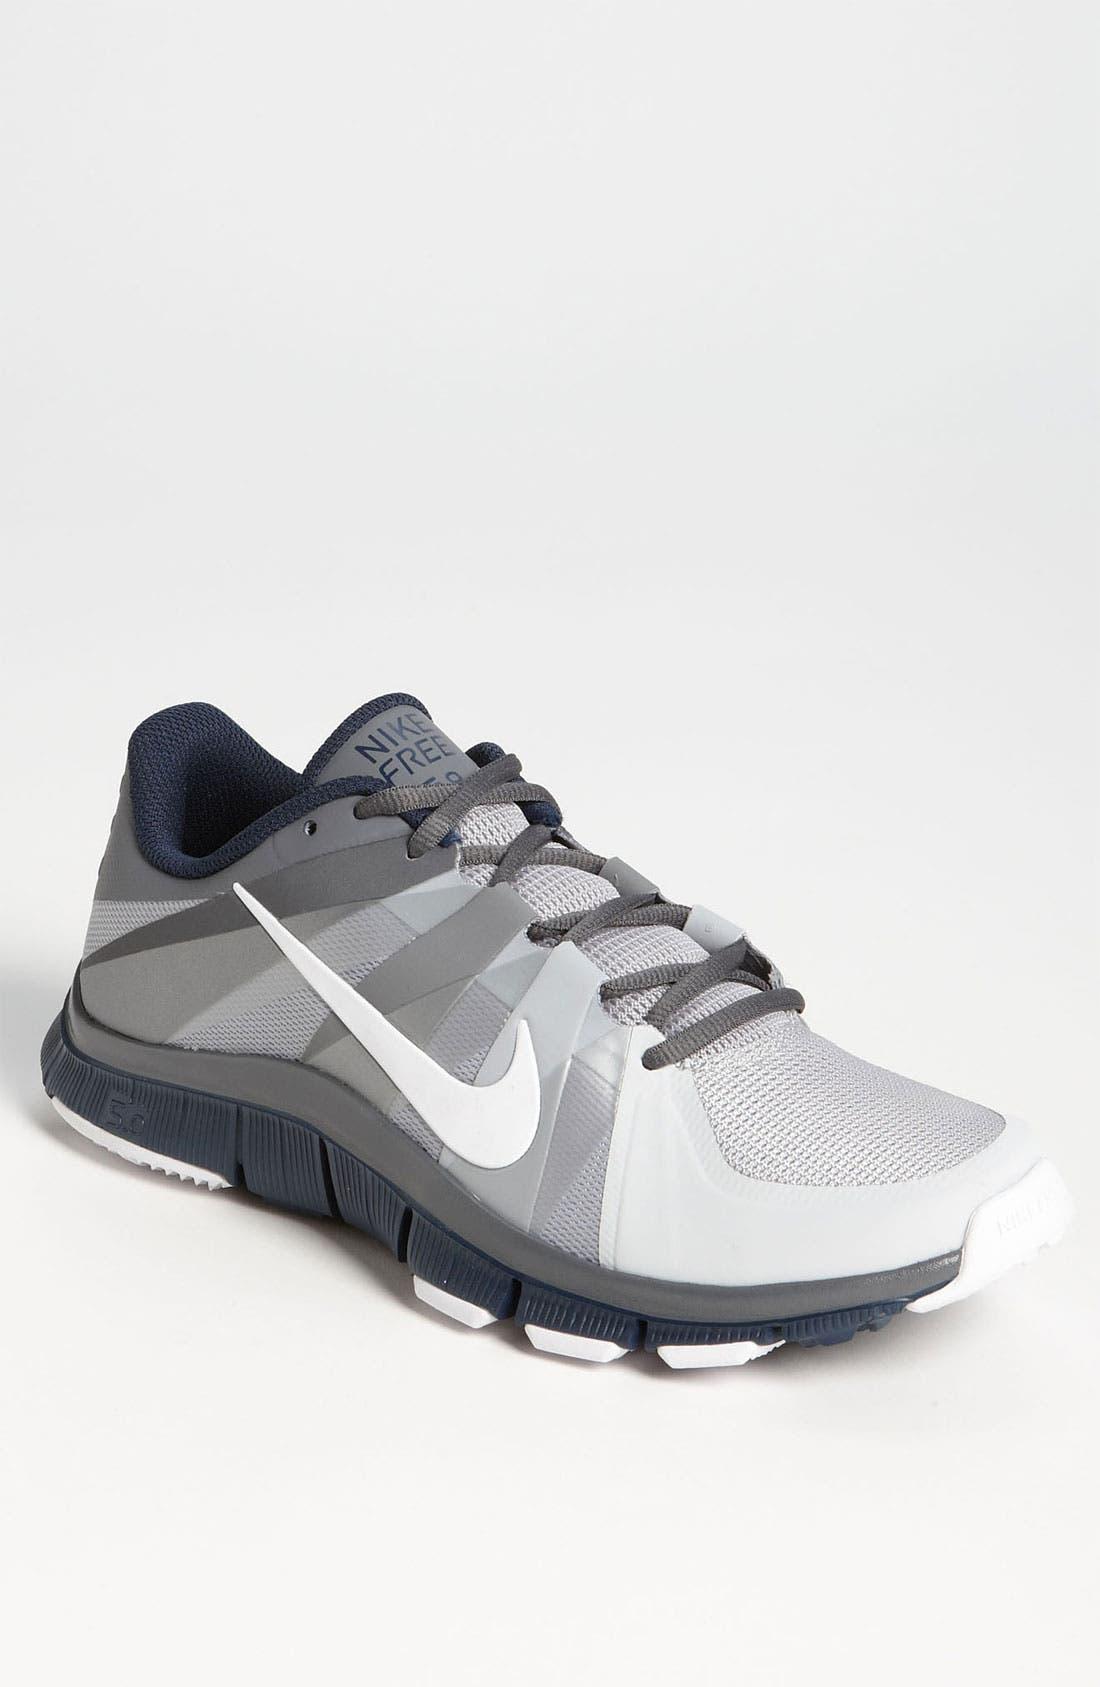 Main Image - Nike 'Free Trainer 5.0 TB' Training Shoe (Men)